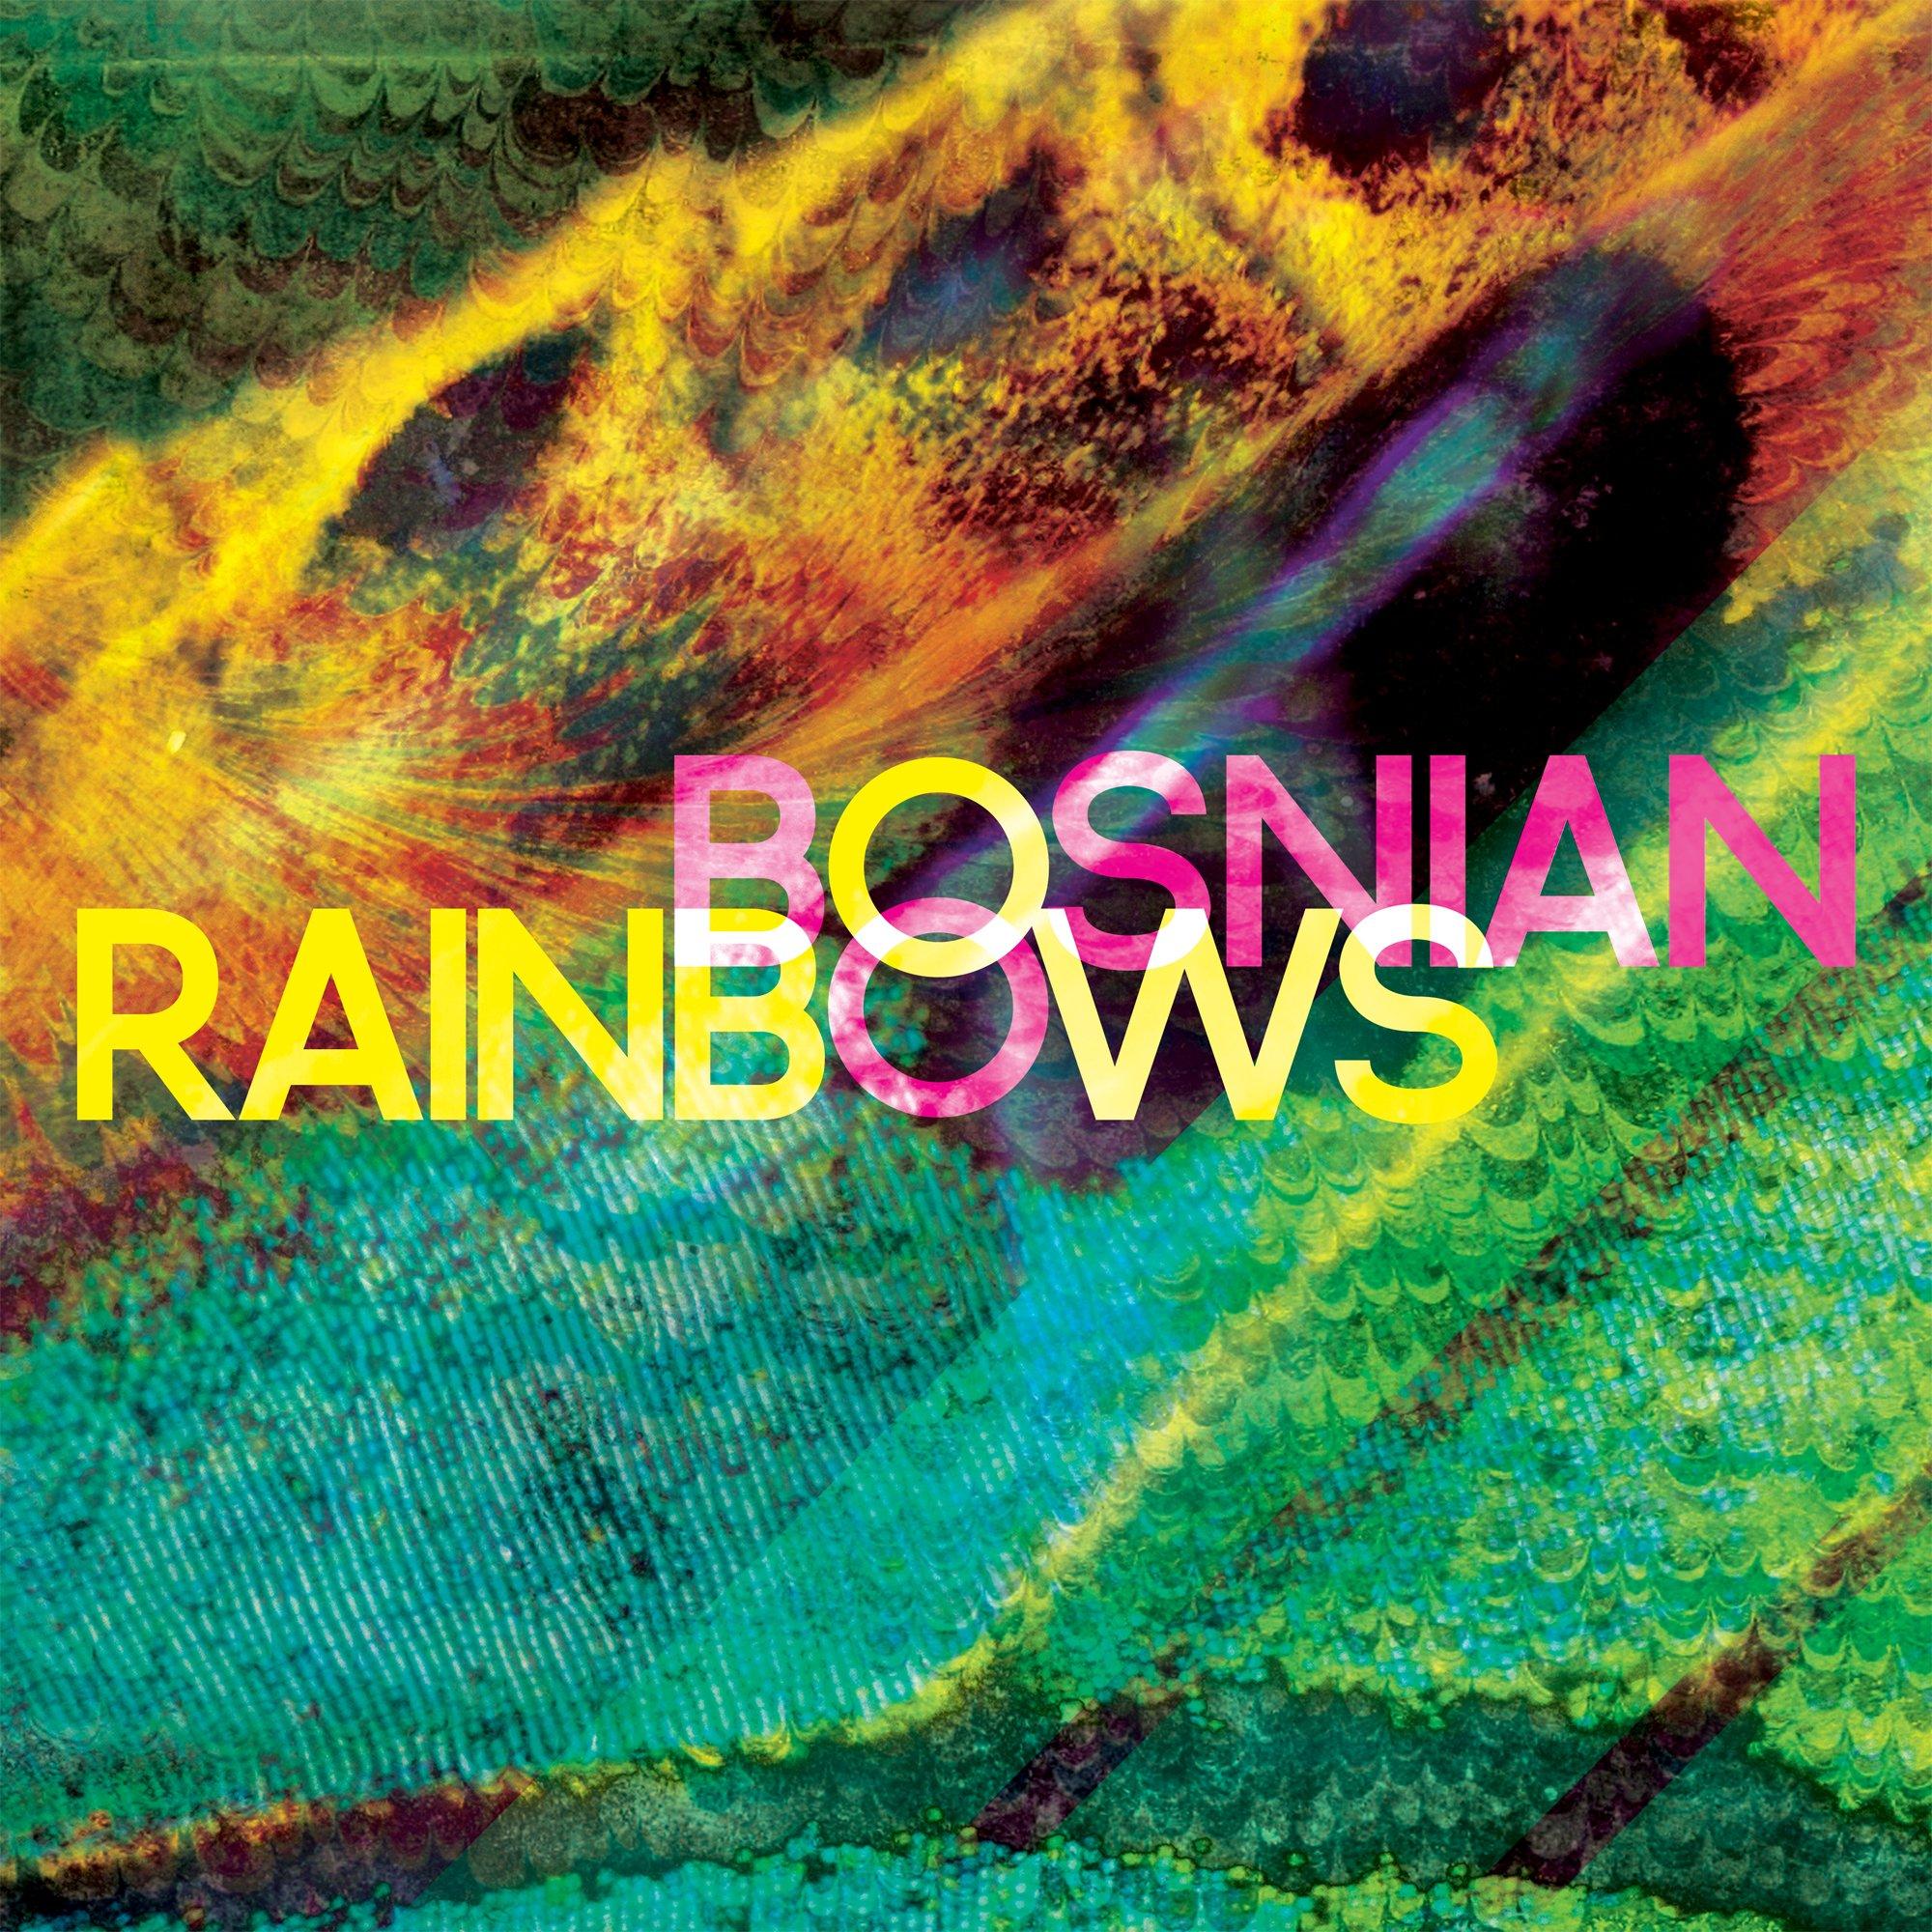 Vinilo : Bosnian Rainbows - Bosnian Rainbows (2 Disc)